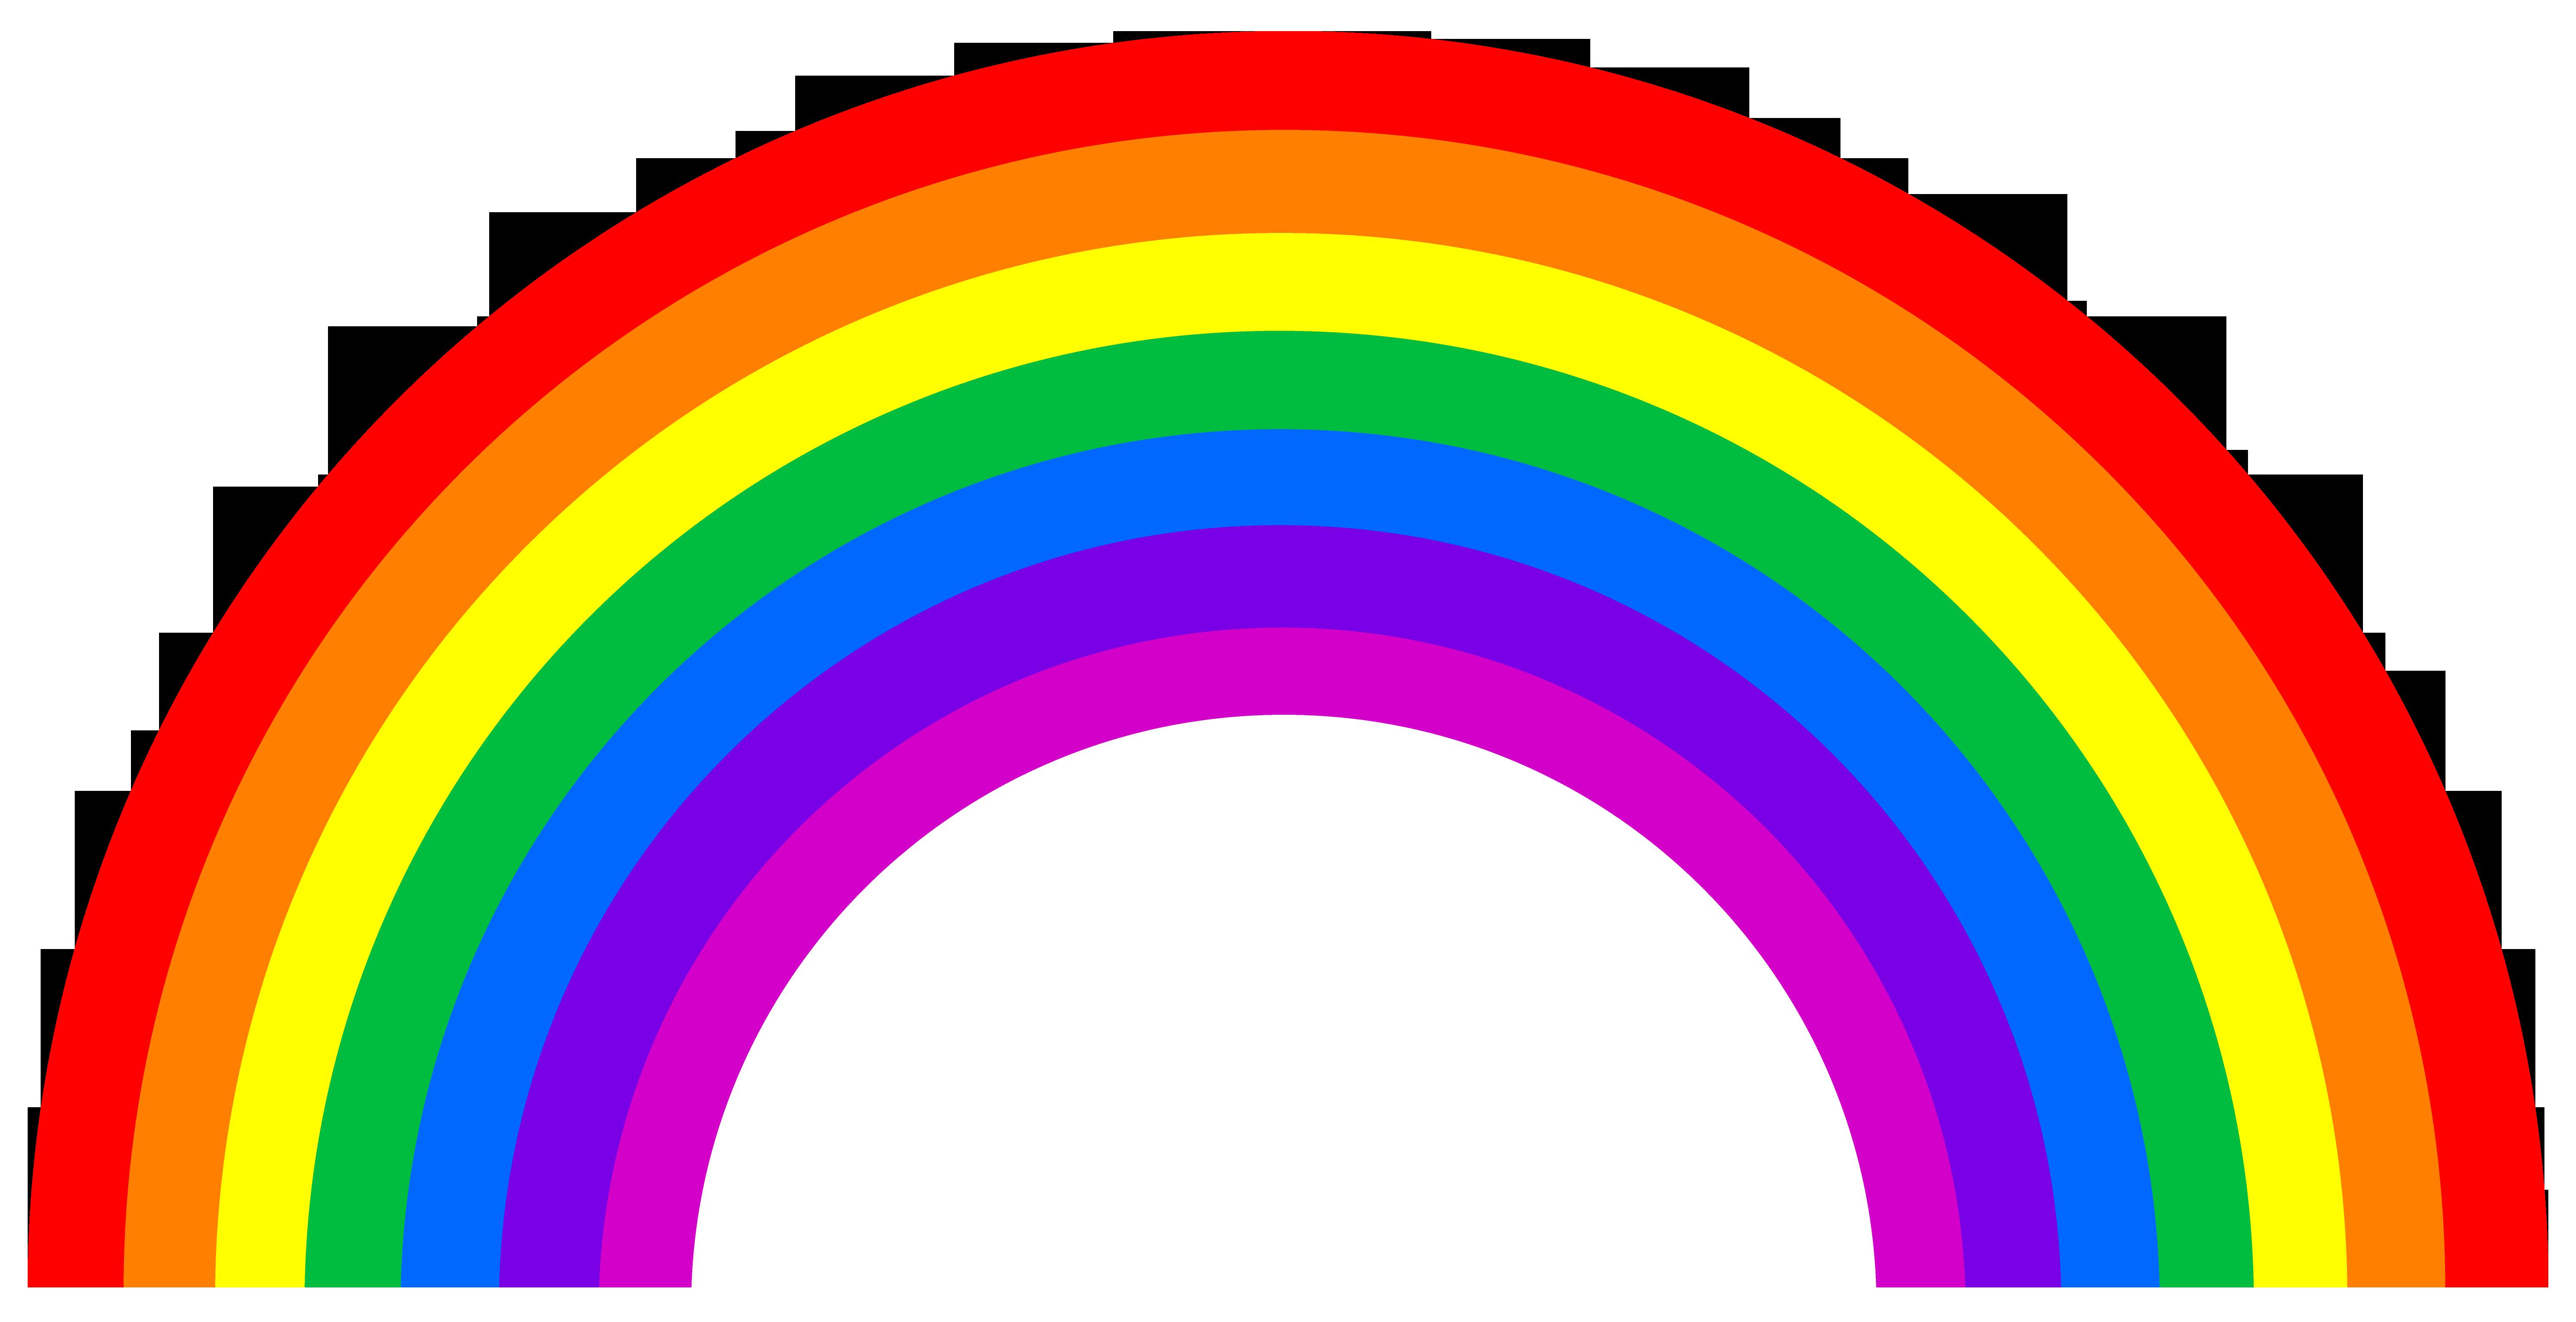 Clipart rainbow cute. Small arc free clip